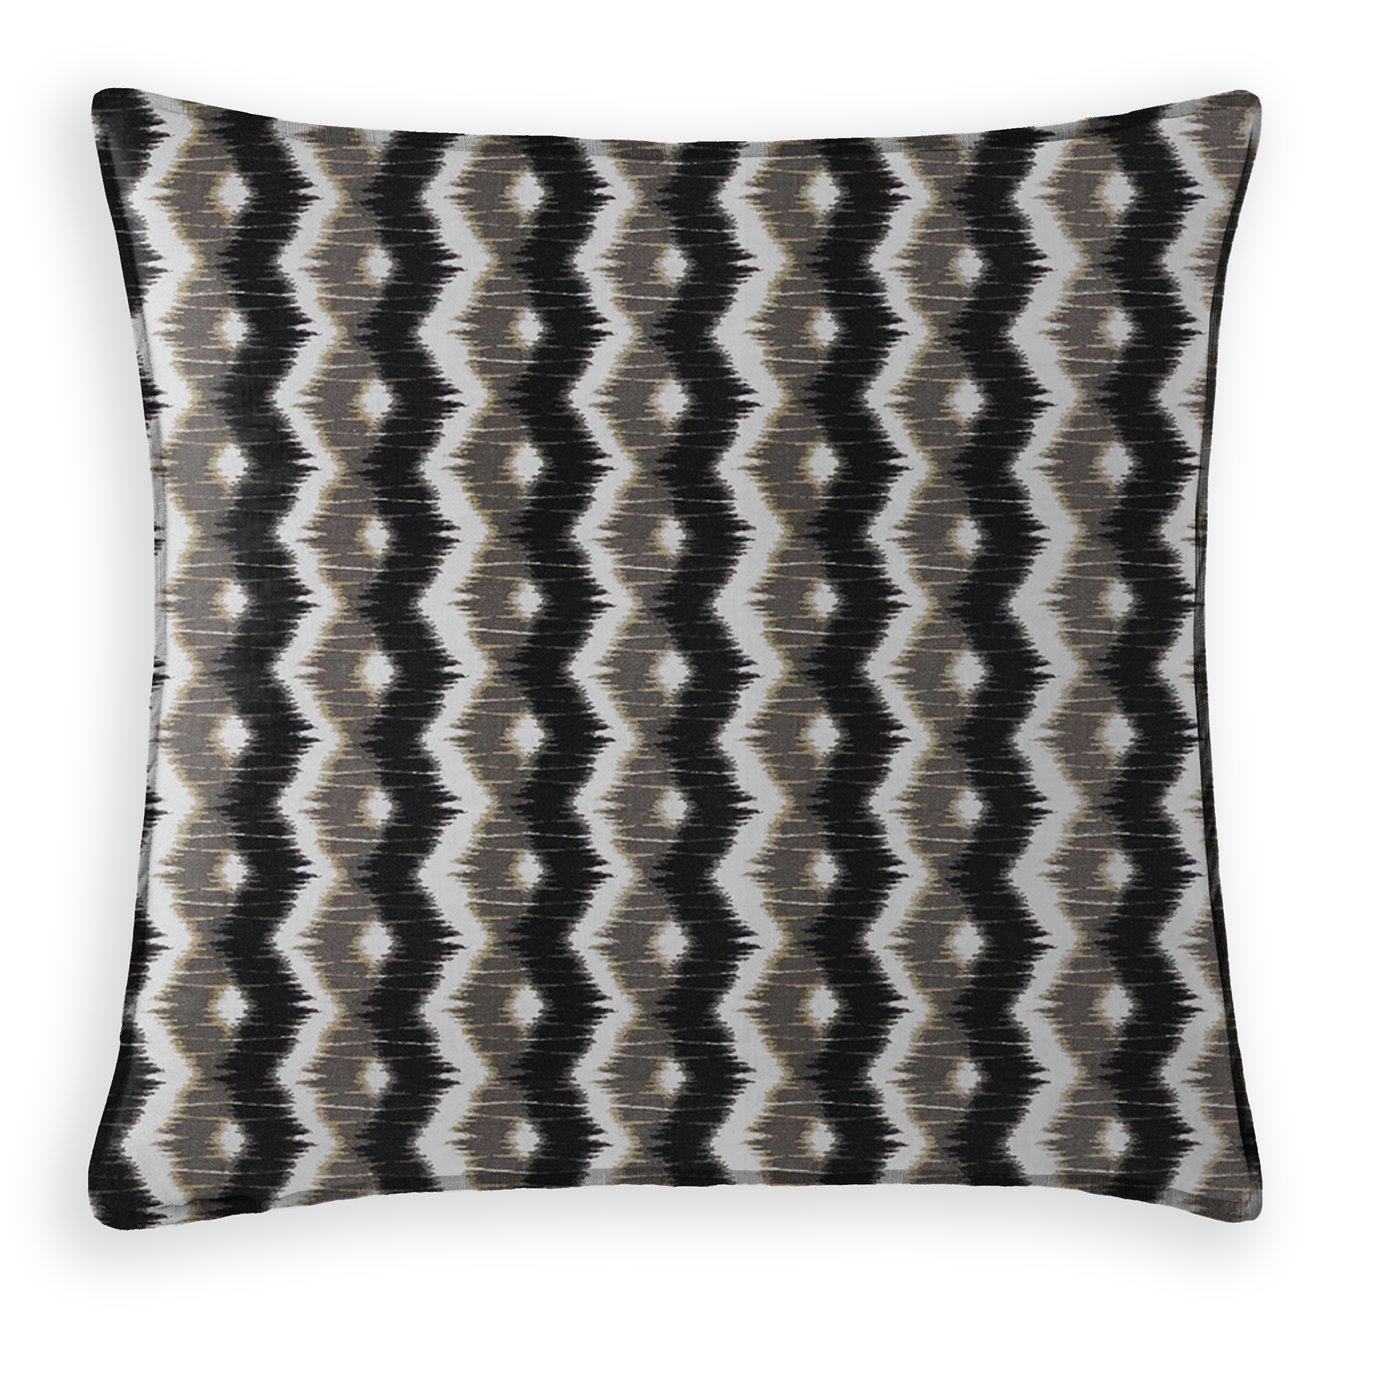 Nelson Decorative Cushion - 18 Inch Square